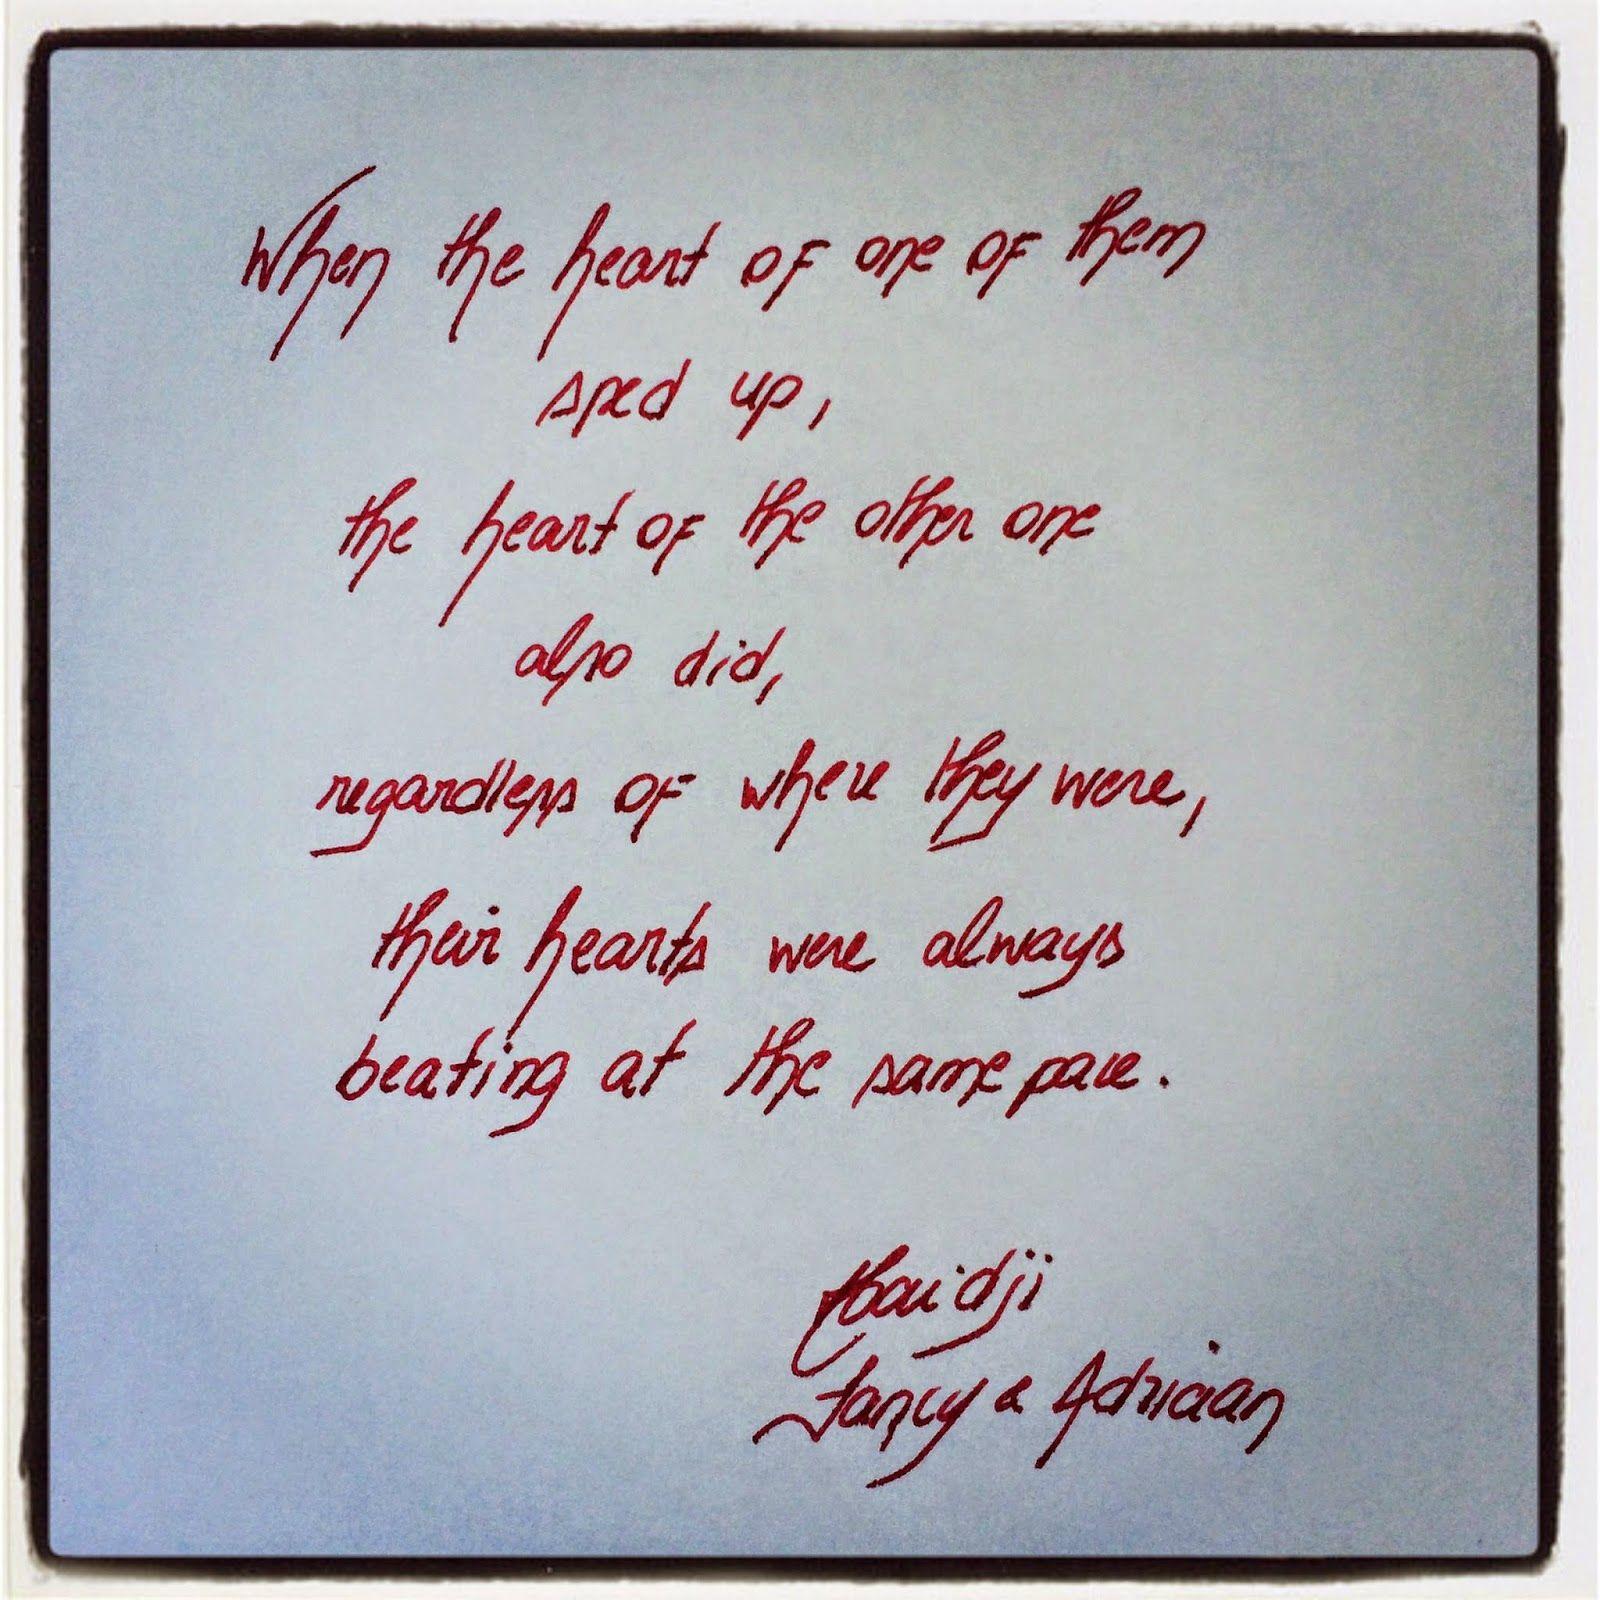 Haidji: Fancy & Adriaan - Haidji - Book Quote - Heartbeat